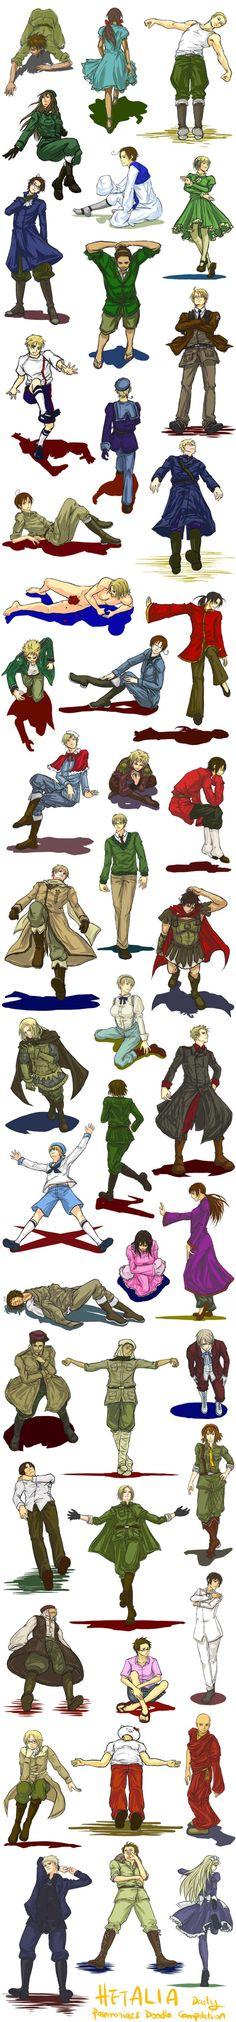 Hetalia (ヘタリア) >>>>>> their positions are weird af Animes On, Spamano, Hetalia Axis Powers, Kaichou Wa Maid Sama, Me Me Me Anime, Fandoms, People, Earth, My Favorite Things